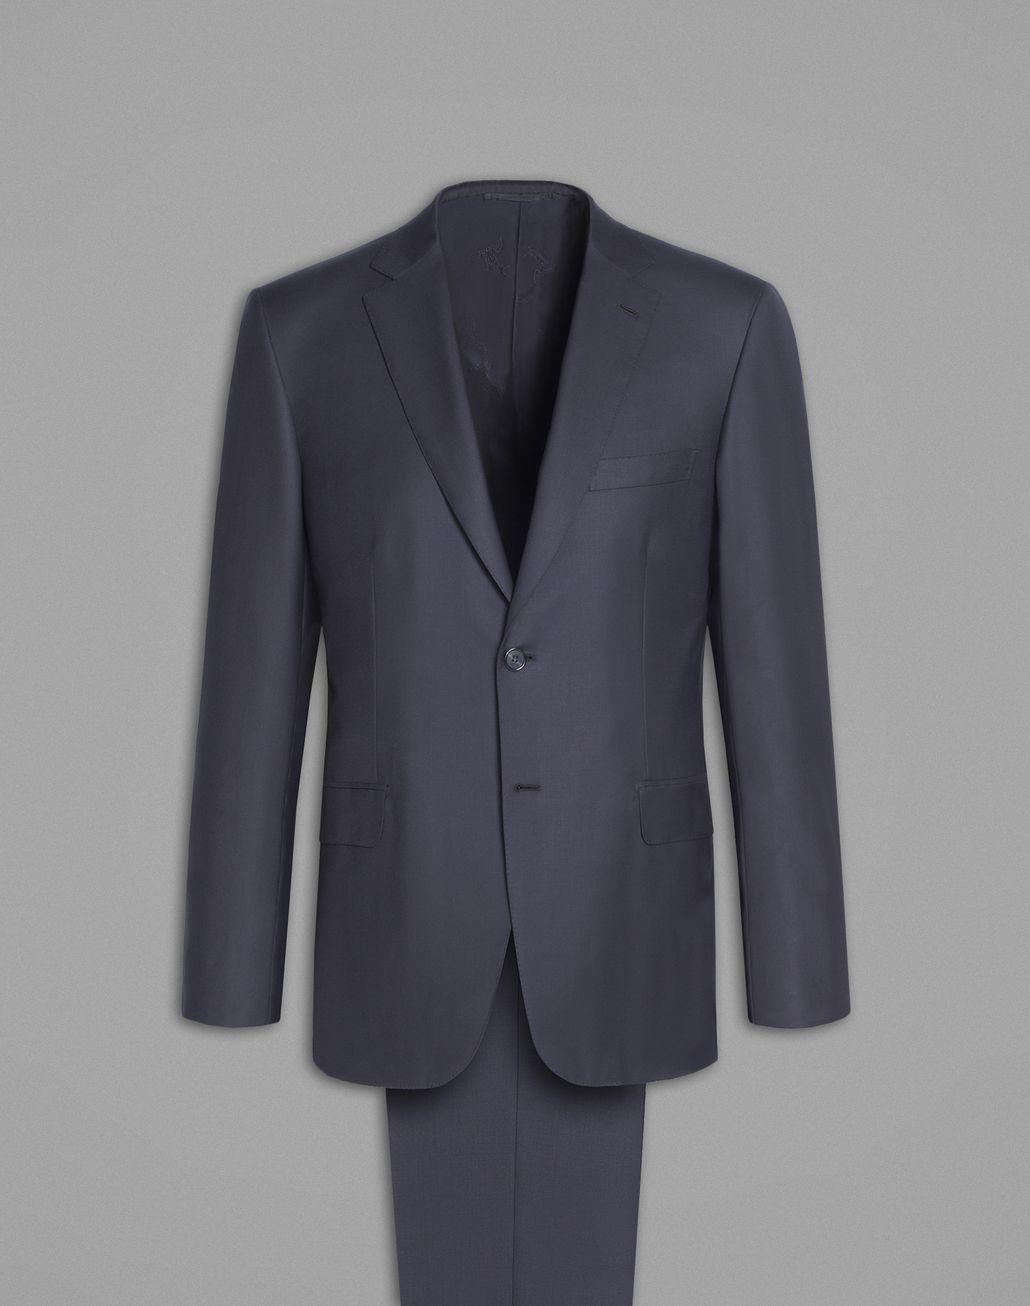 49b9f4f85 'Essential' Navy Blue Brunico Suit